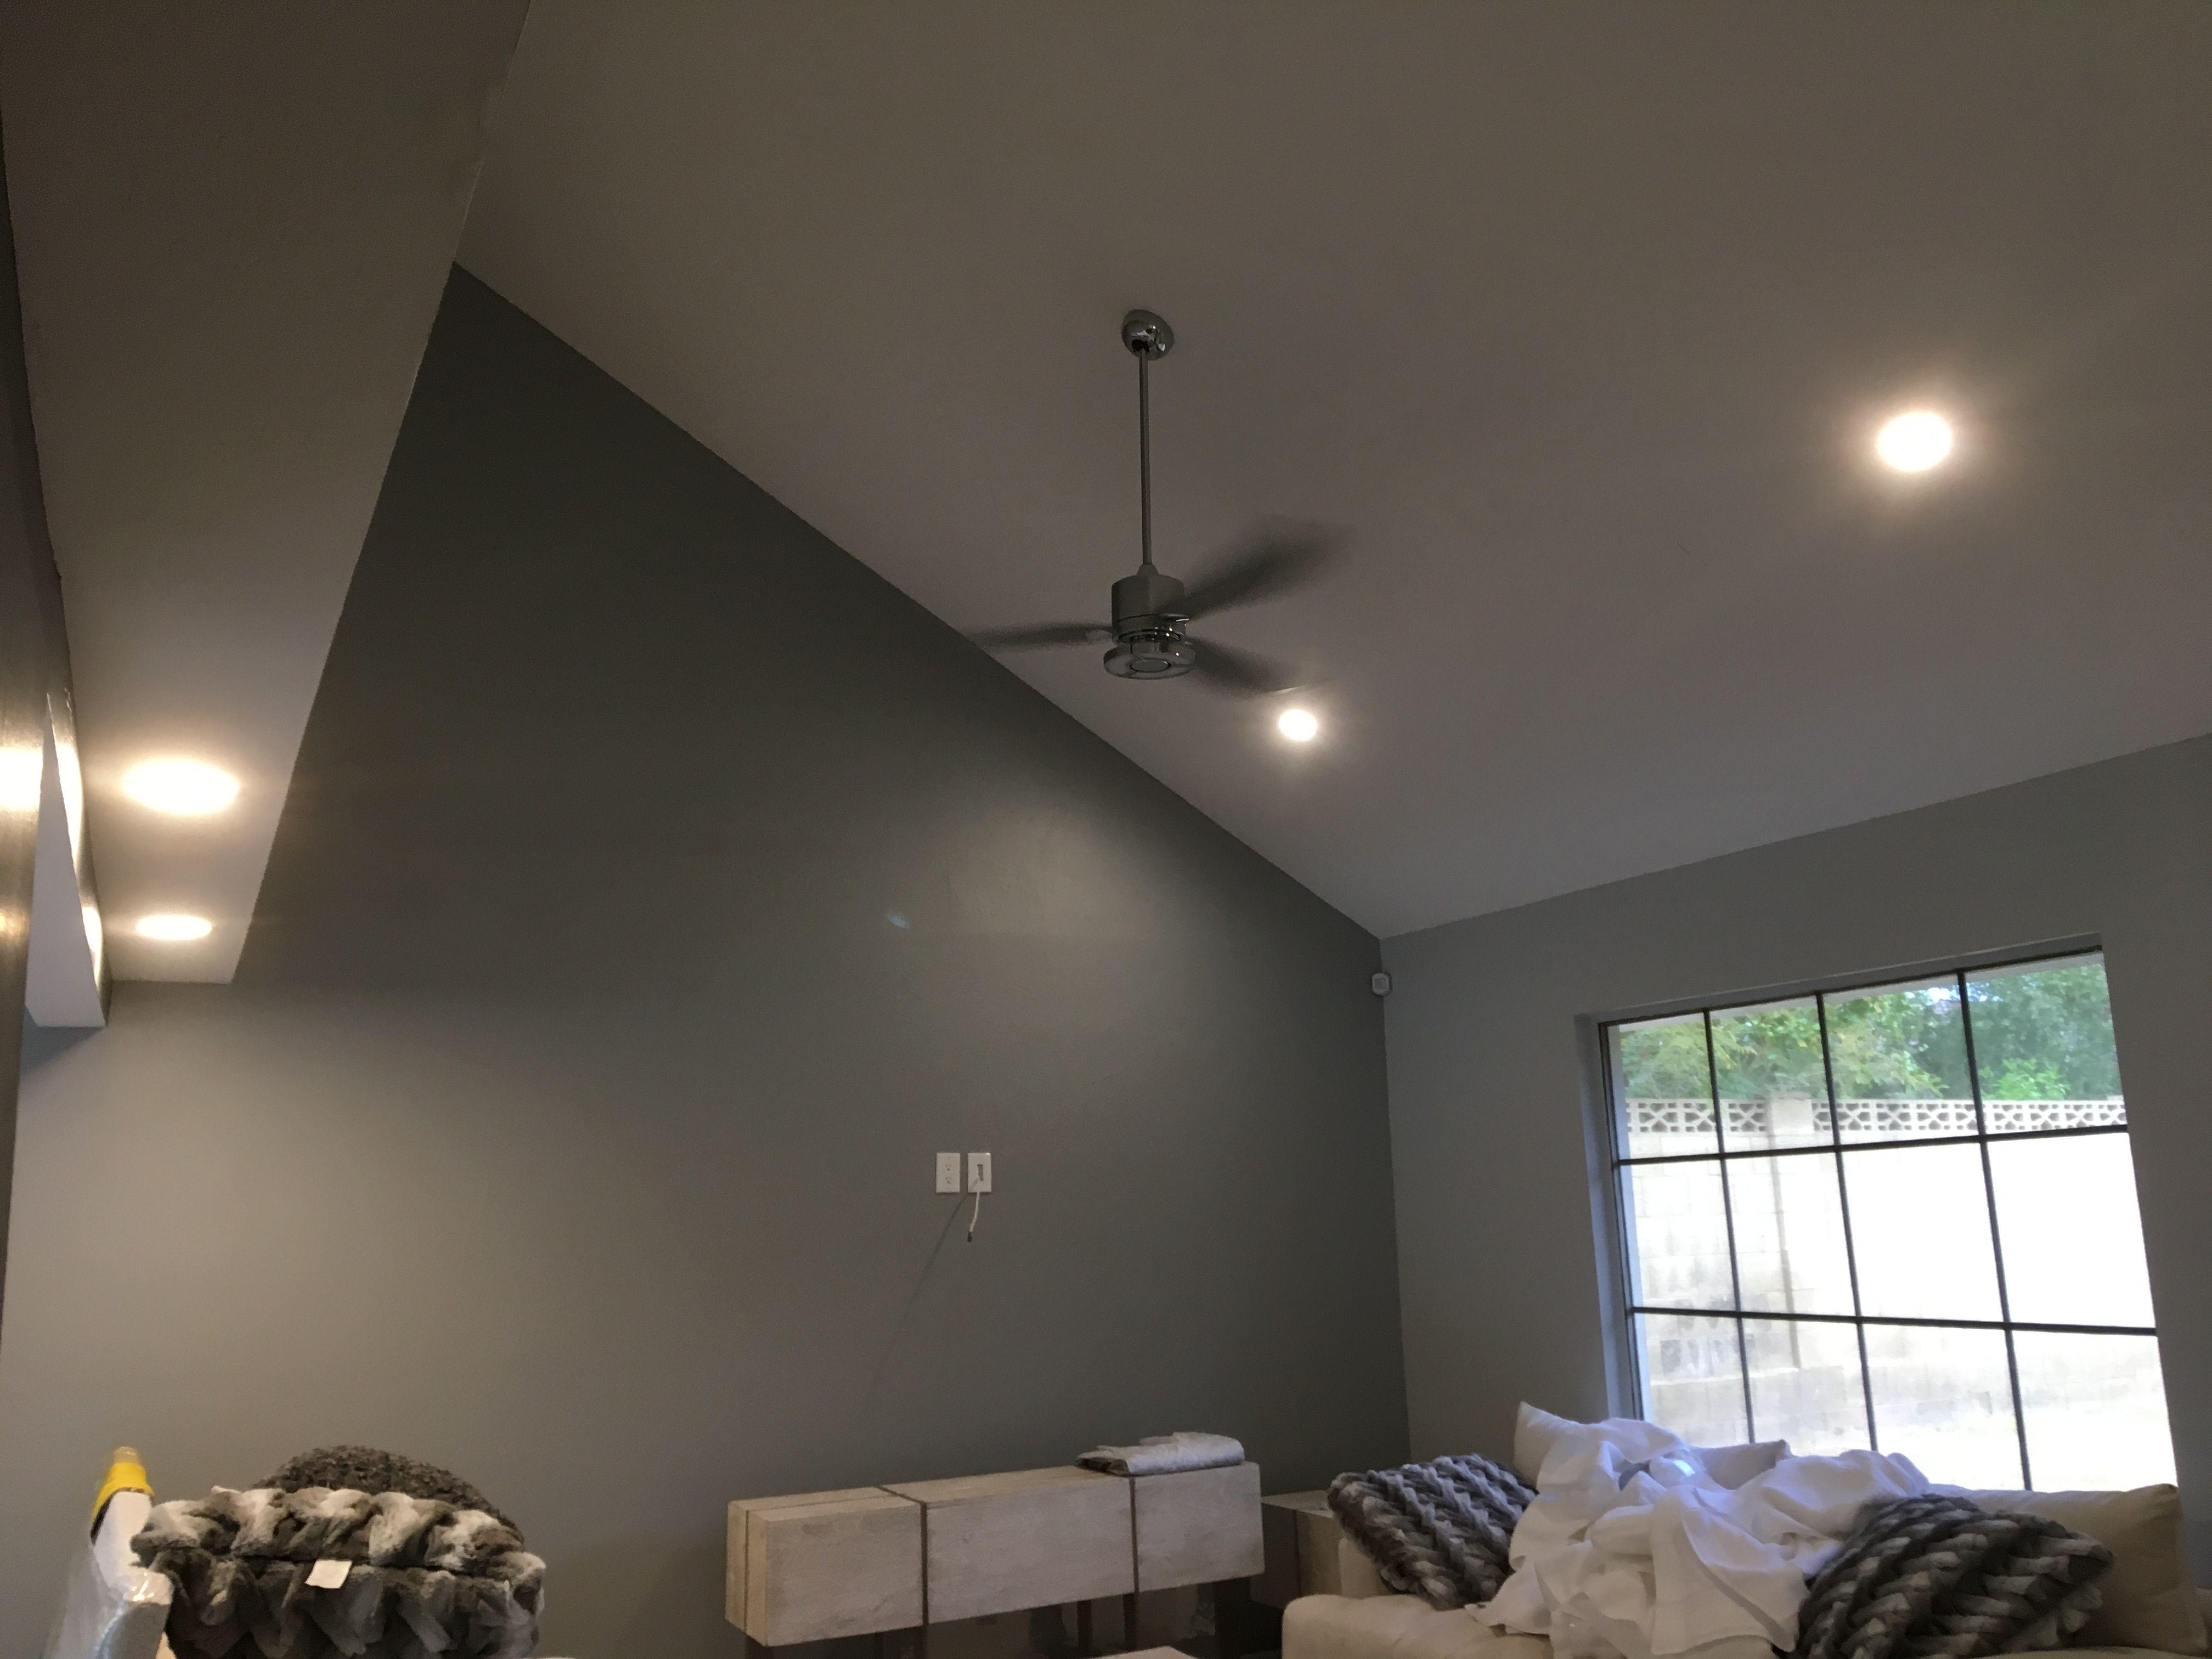 6 Led Recessed Lighting